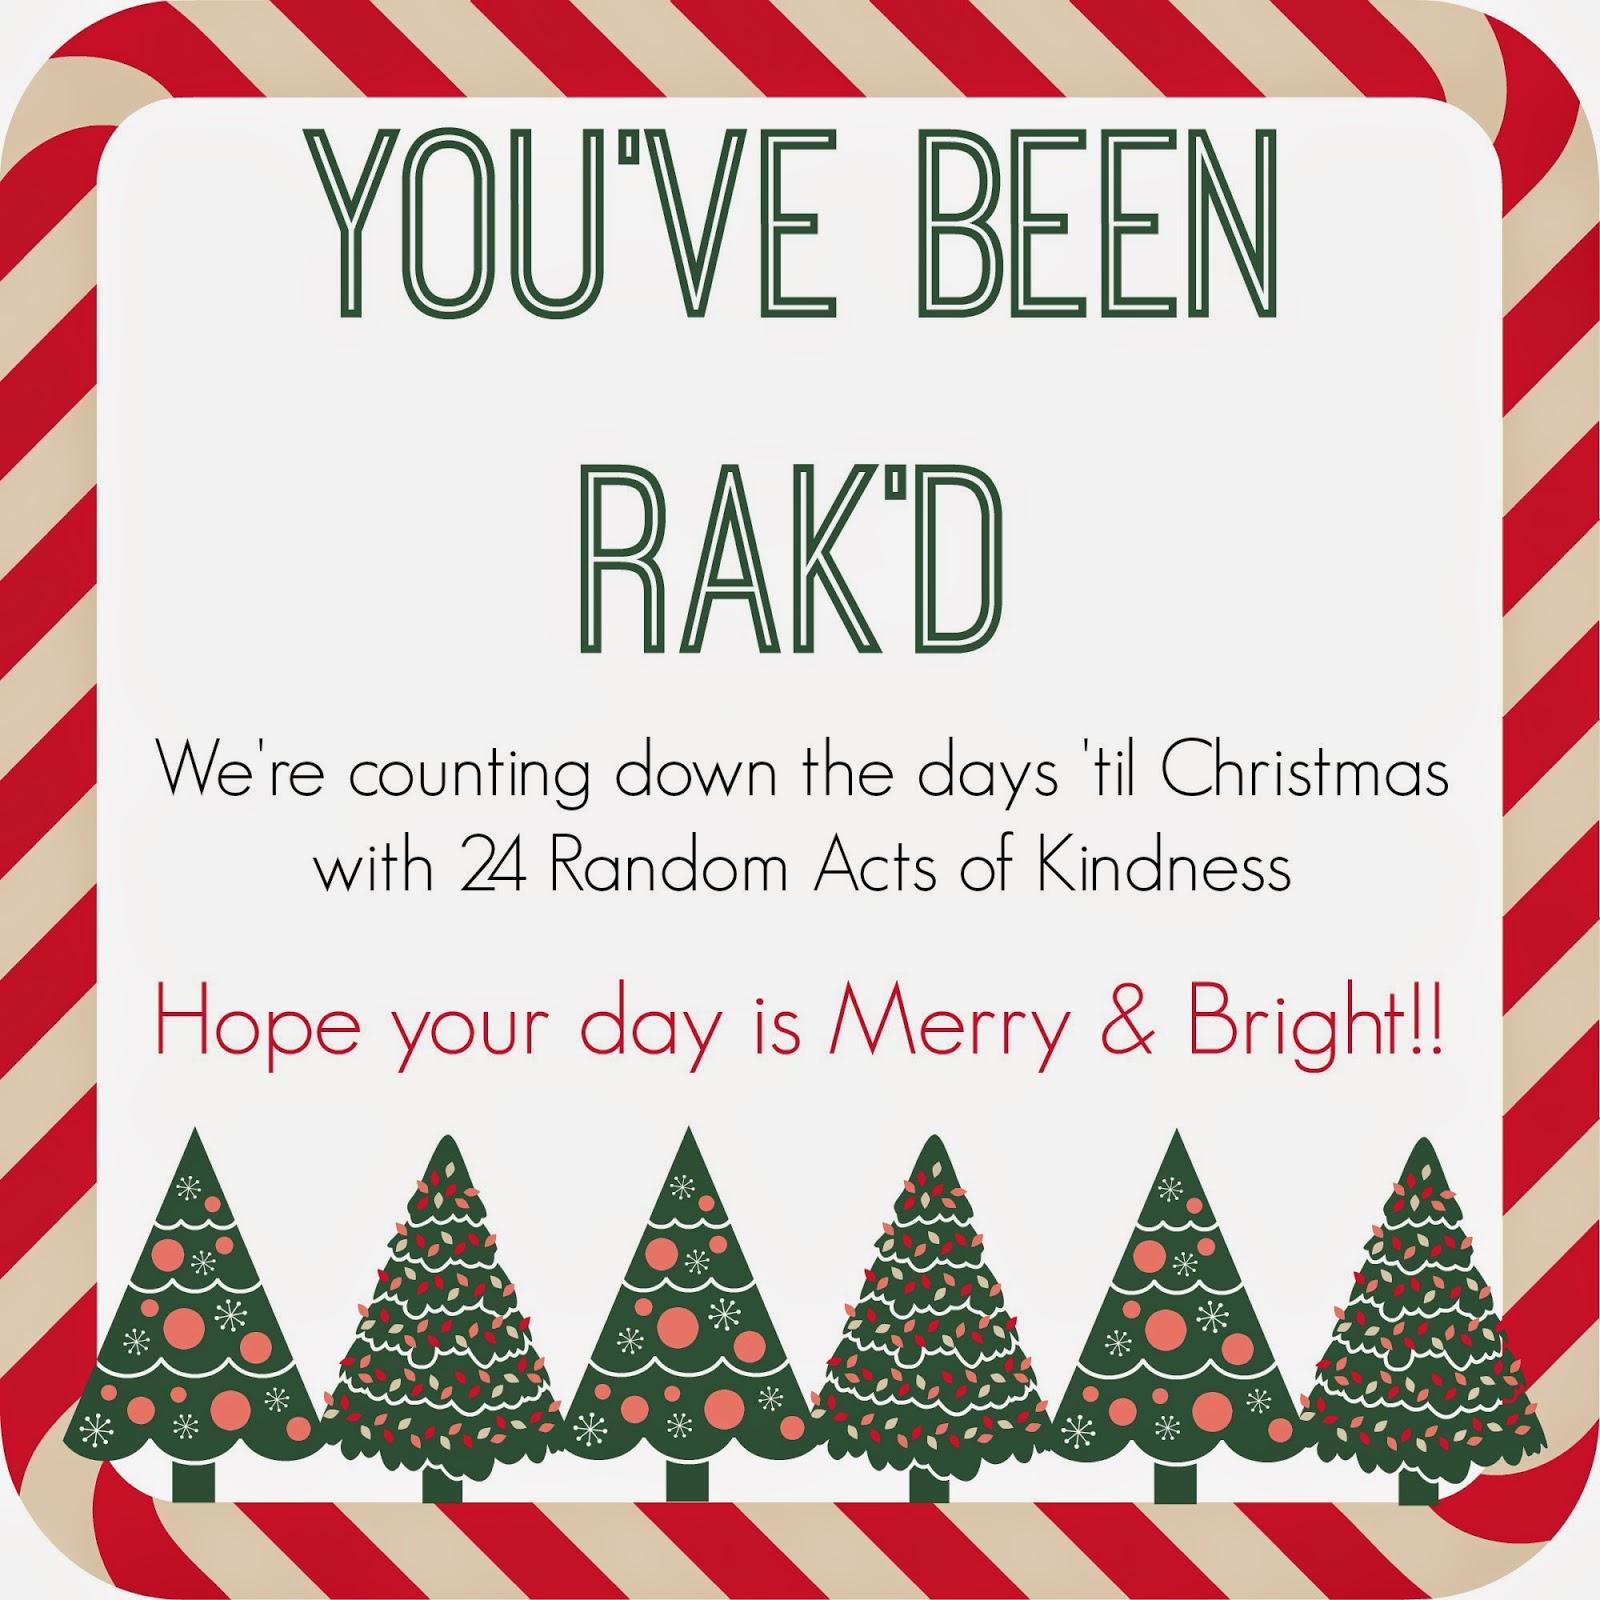 Random Acts of Kindness Advent Calendar Printable  #RAK #Advent #Kindness #Christmas #Printable